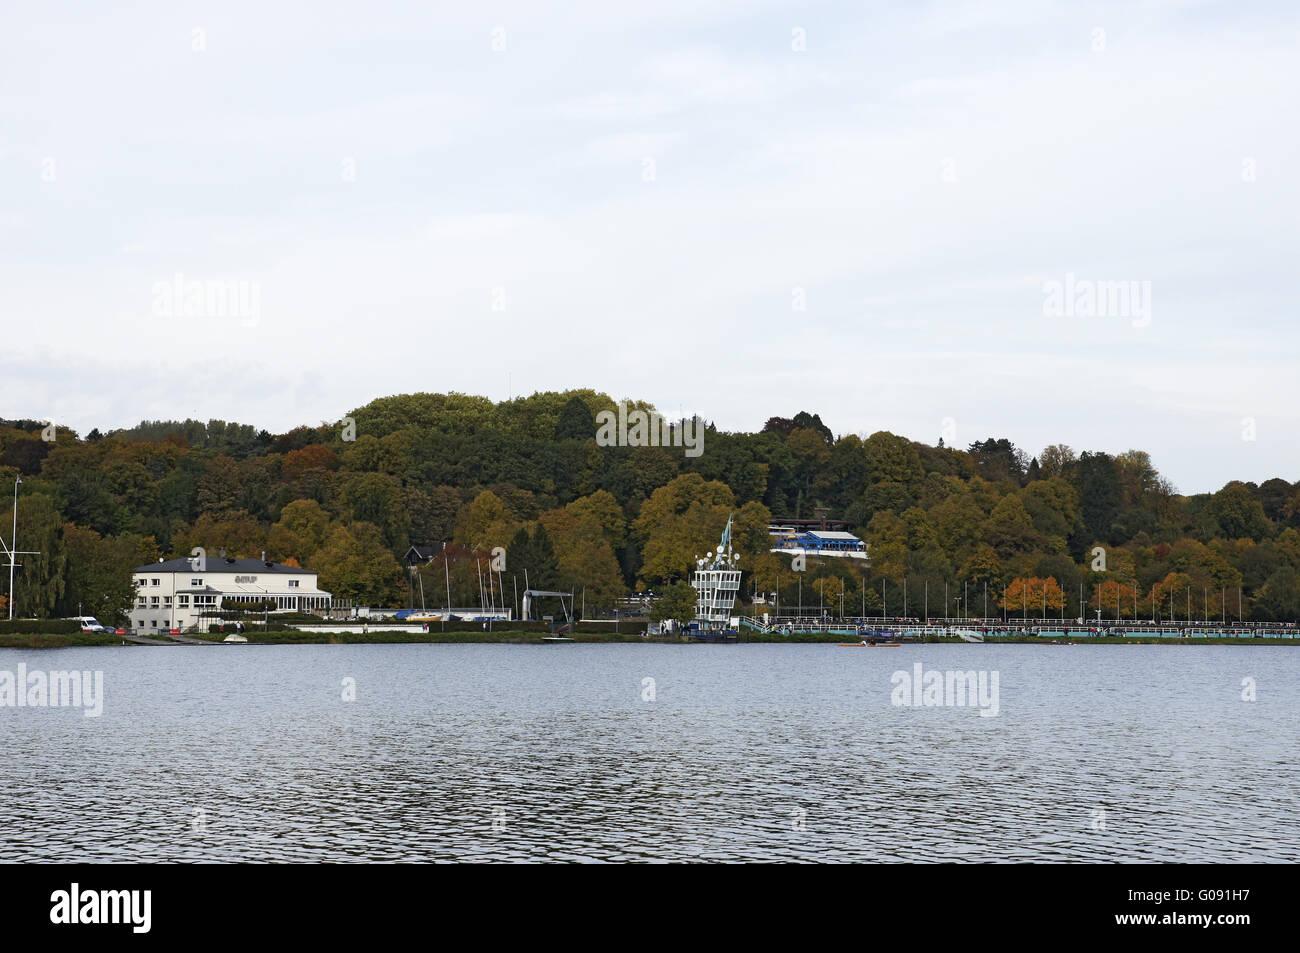 Autumnally atmosphere , Baldeneysee, Essen, German Stock Photo